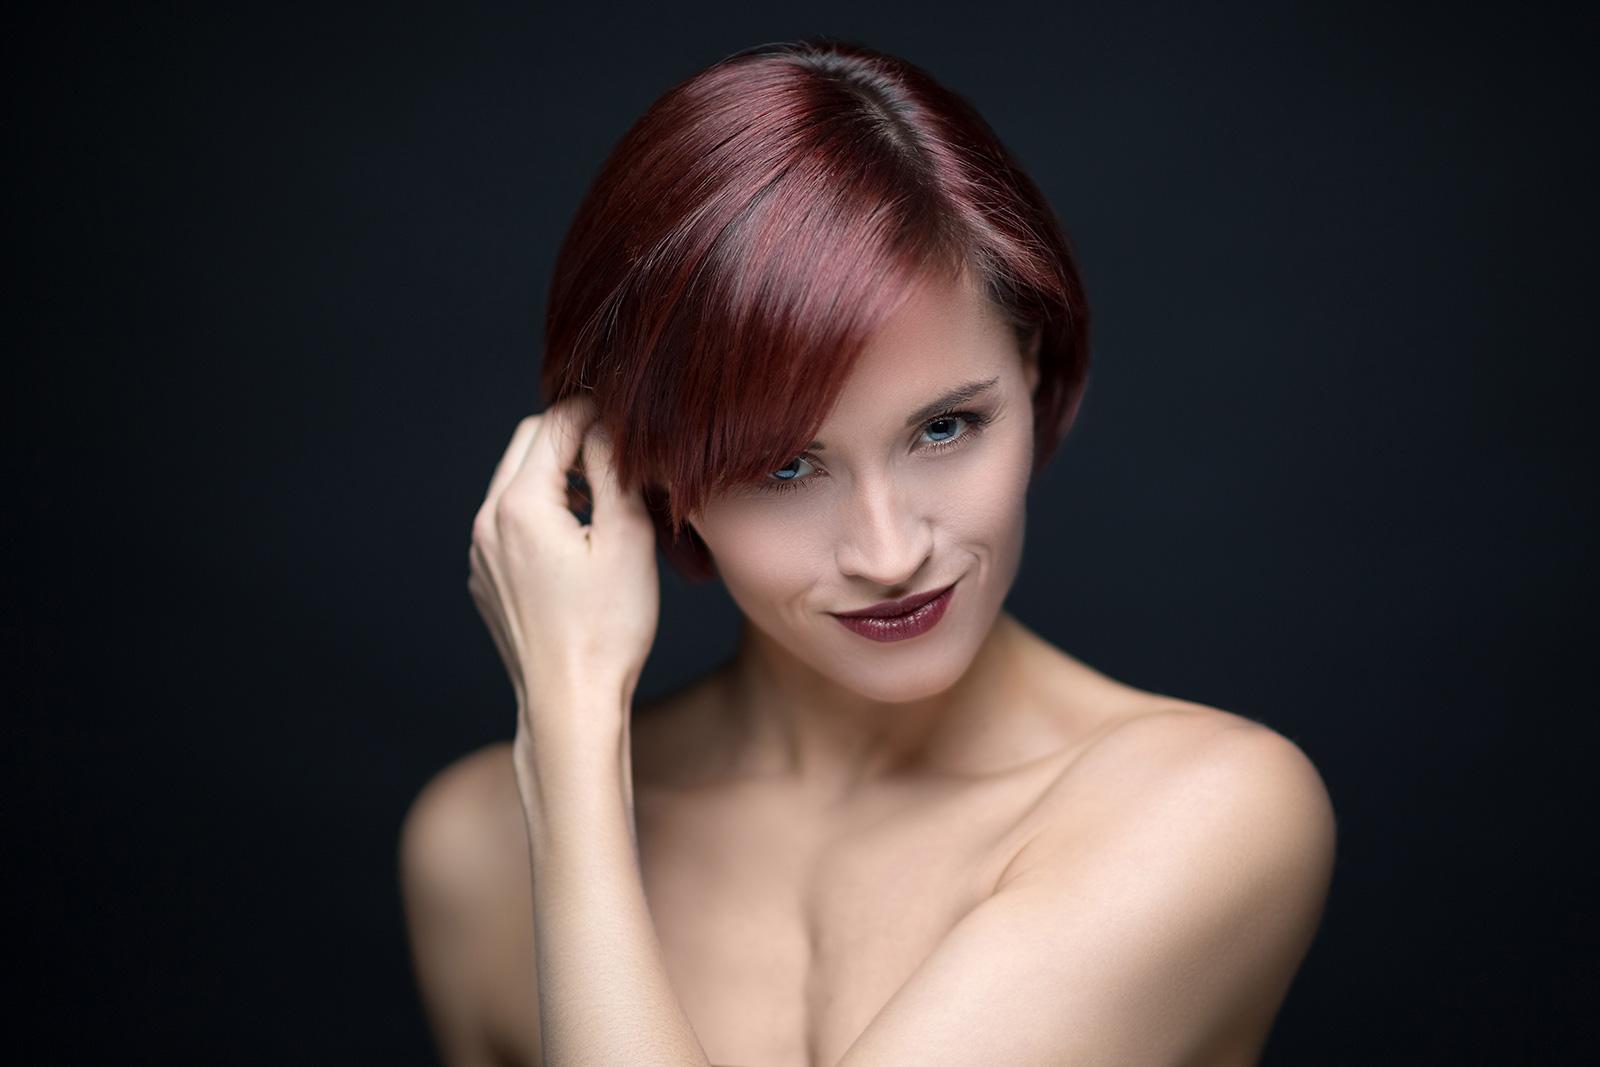 Beauty, Woman, Studioshooting, Studio, Fotostudio